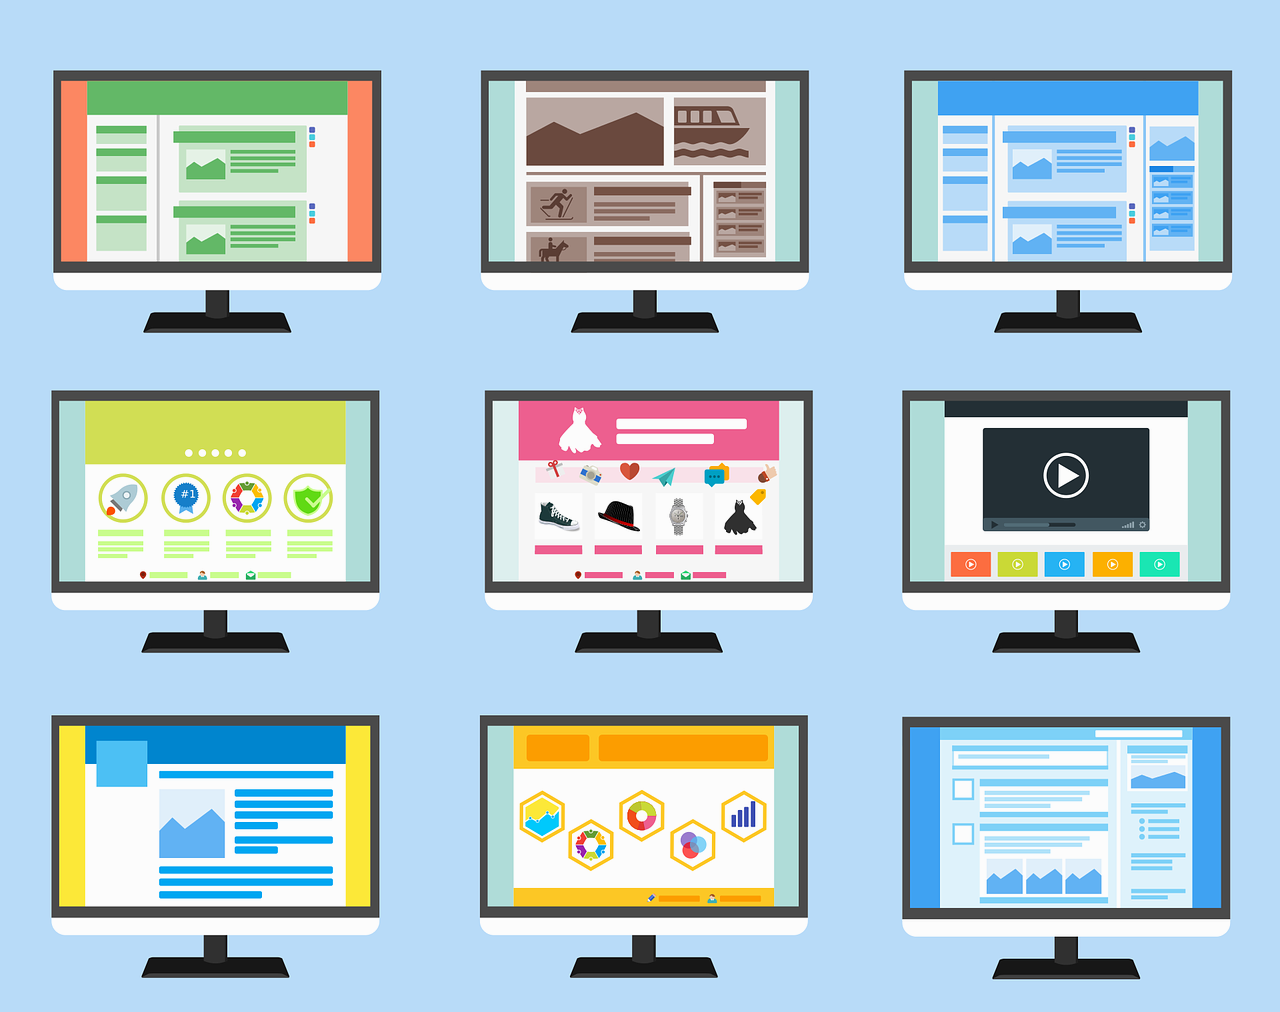 Заработок в интернете веб-дизайн